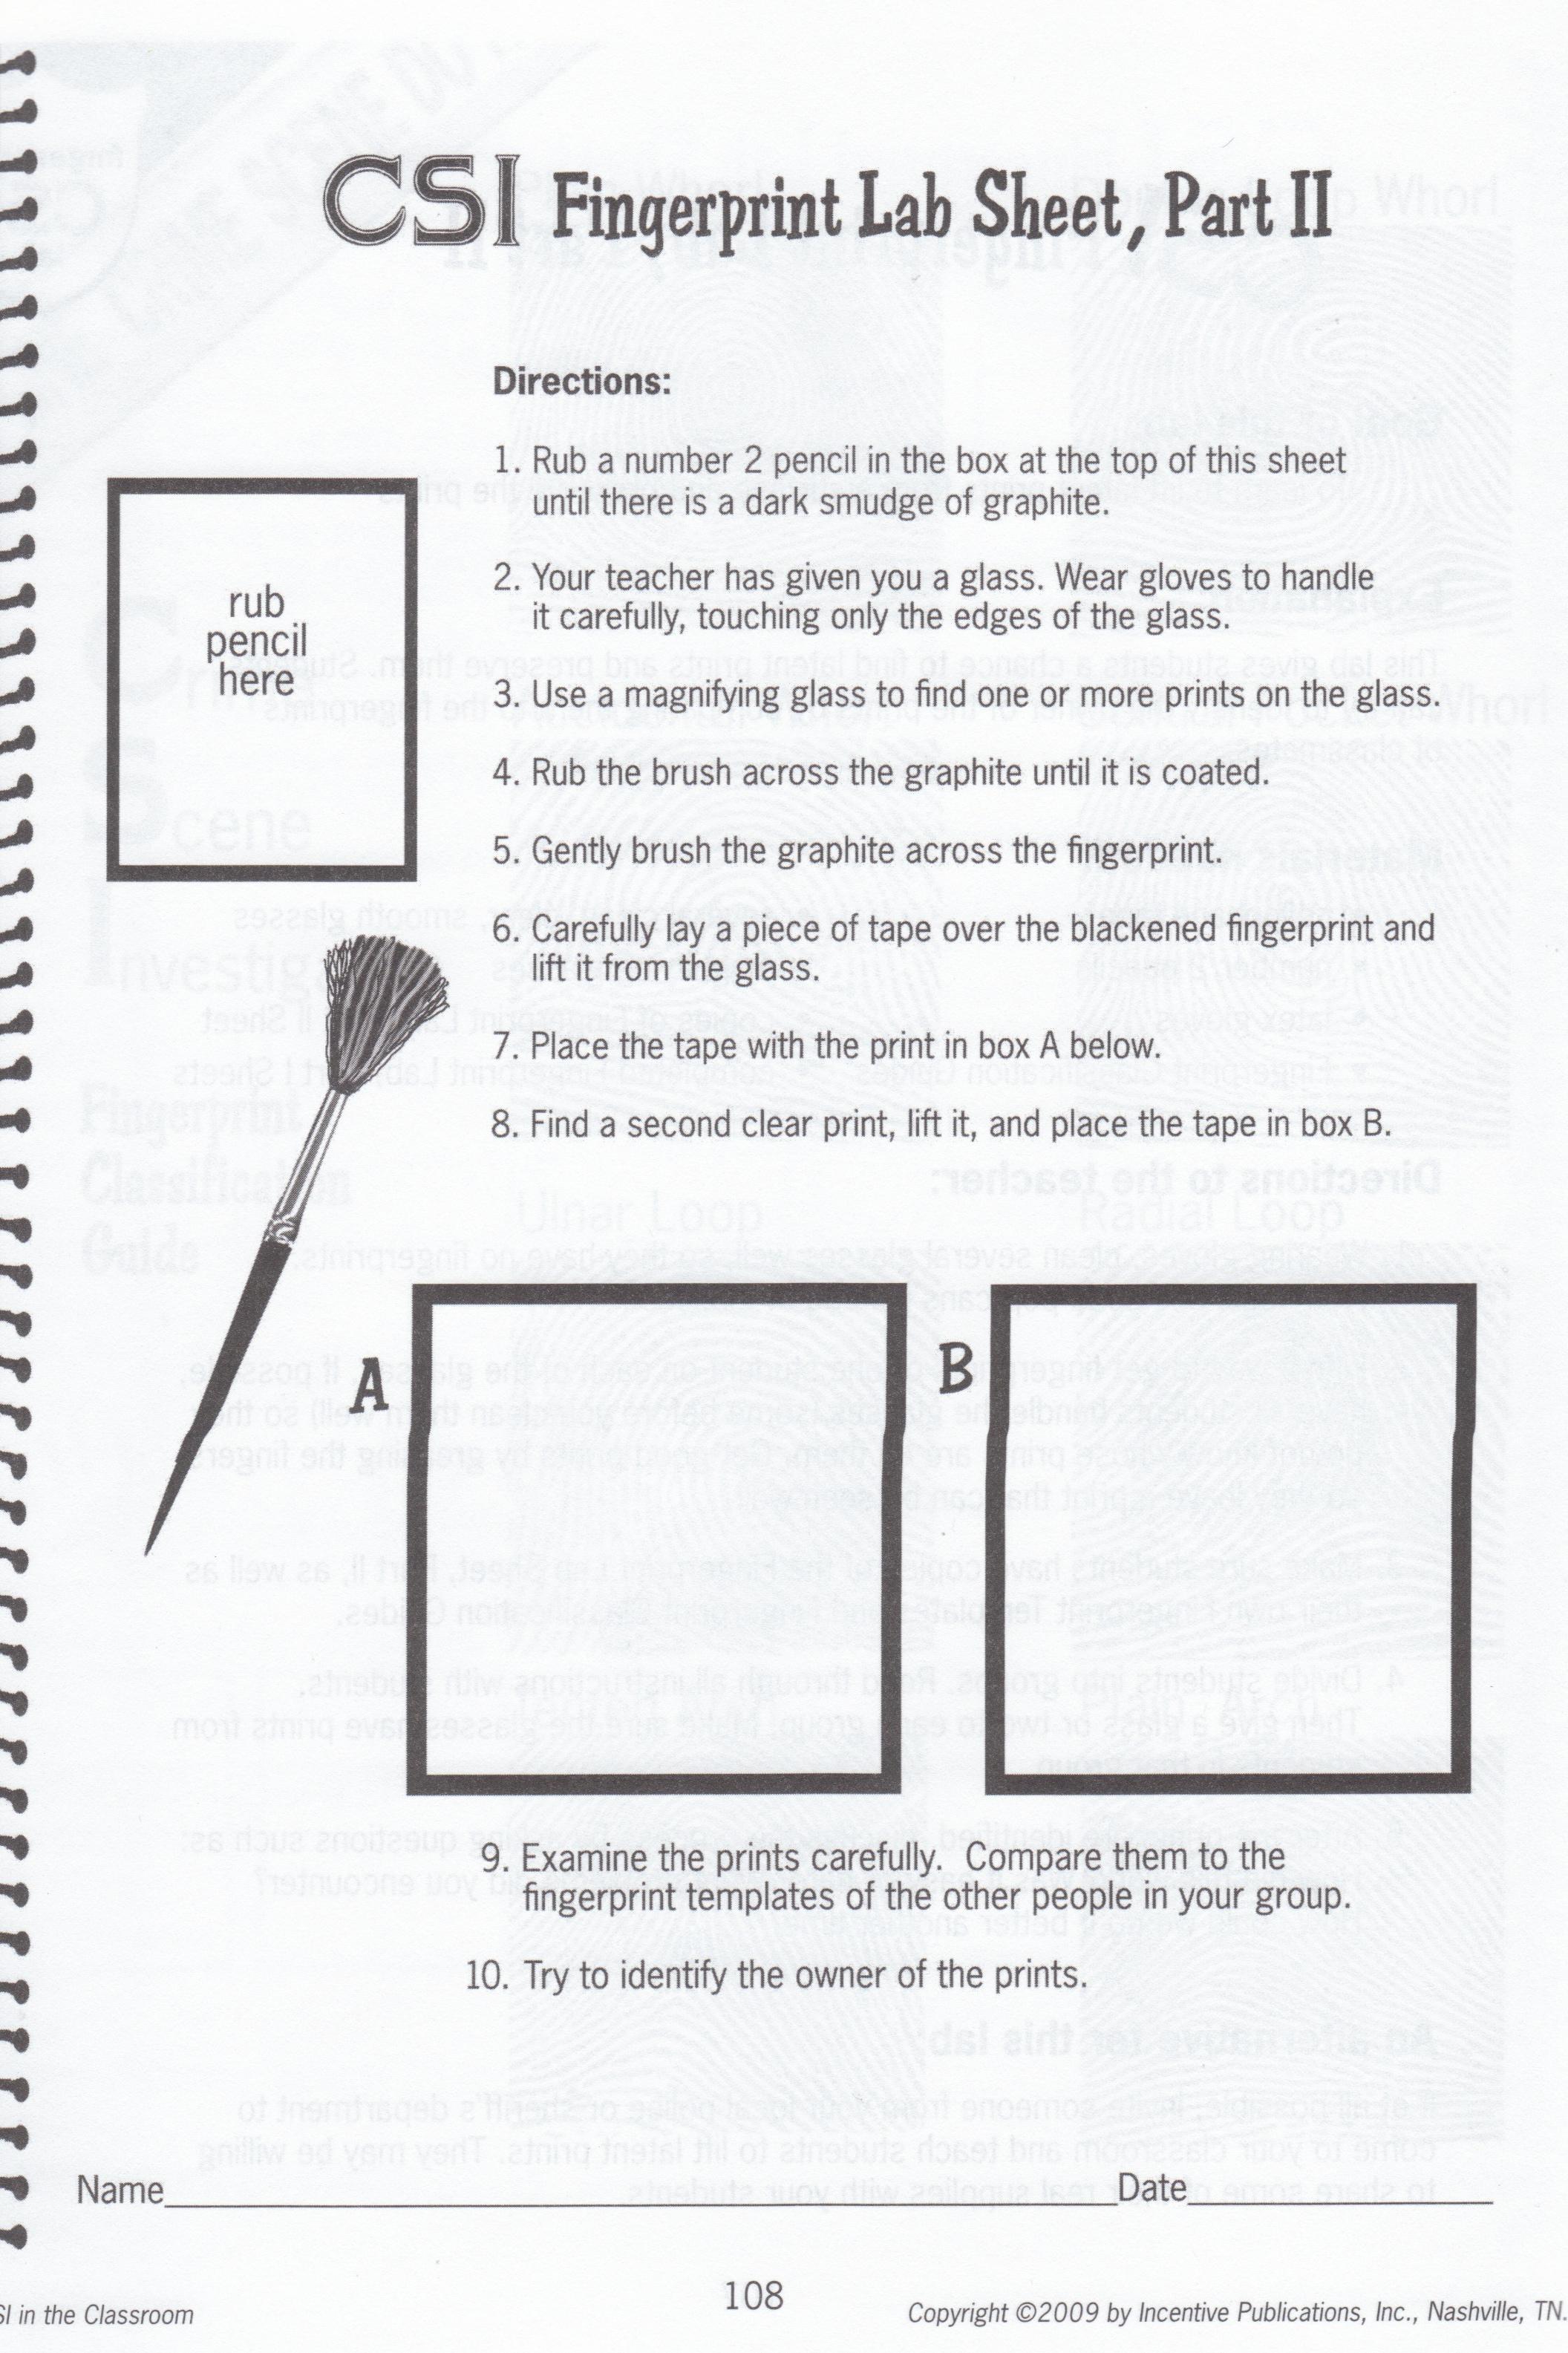 Free download or printable math worksheets on mibb design com